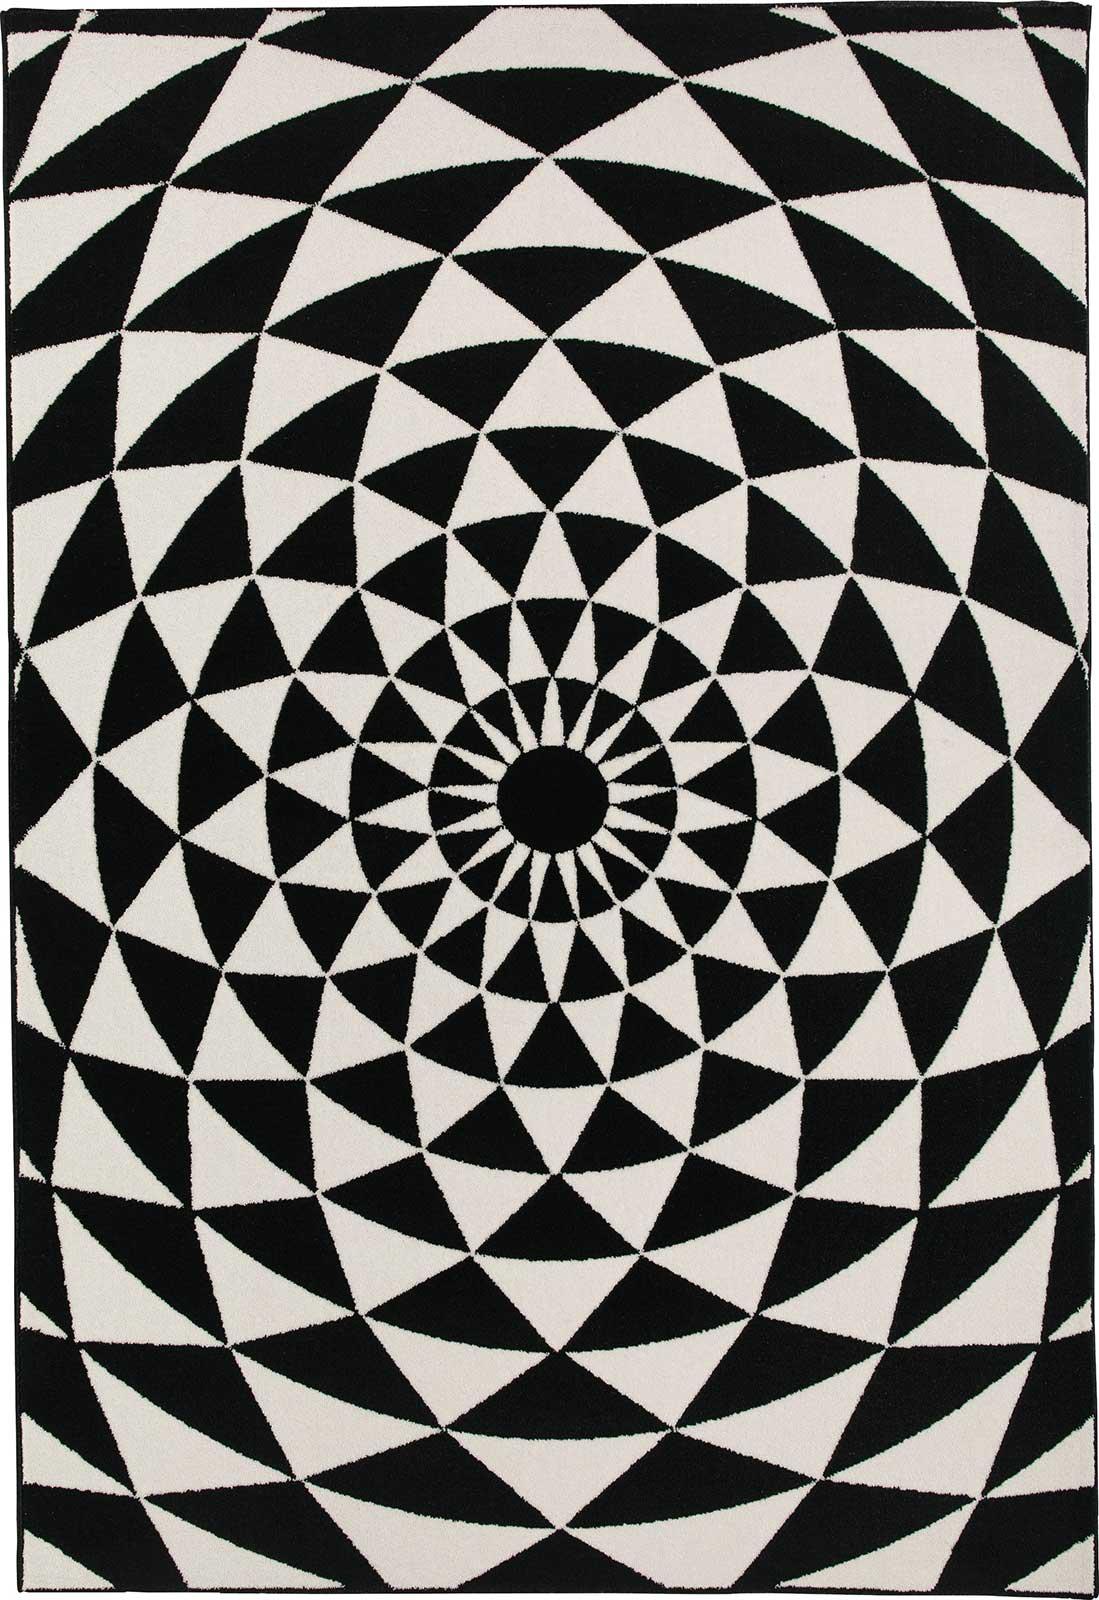 Biancaneve tappeto rettangolare bianco e nero italy - Tappeto bianco nero ...